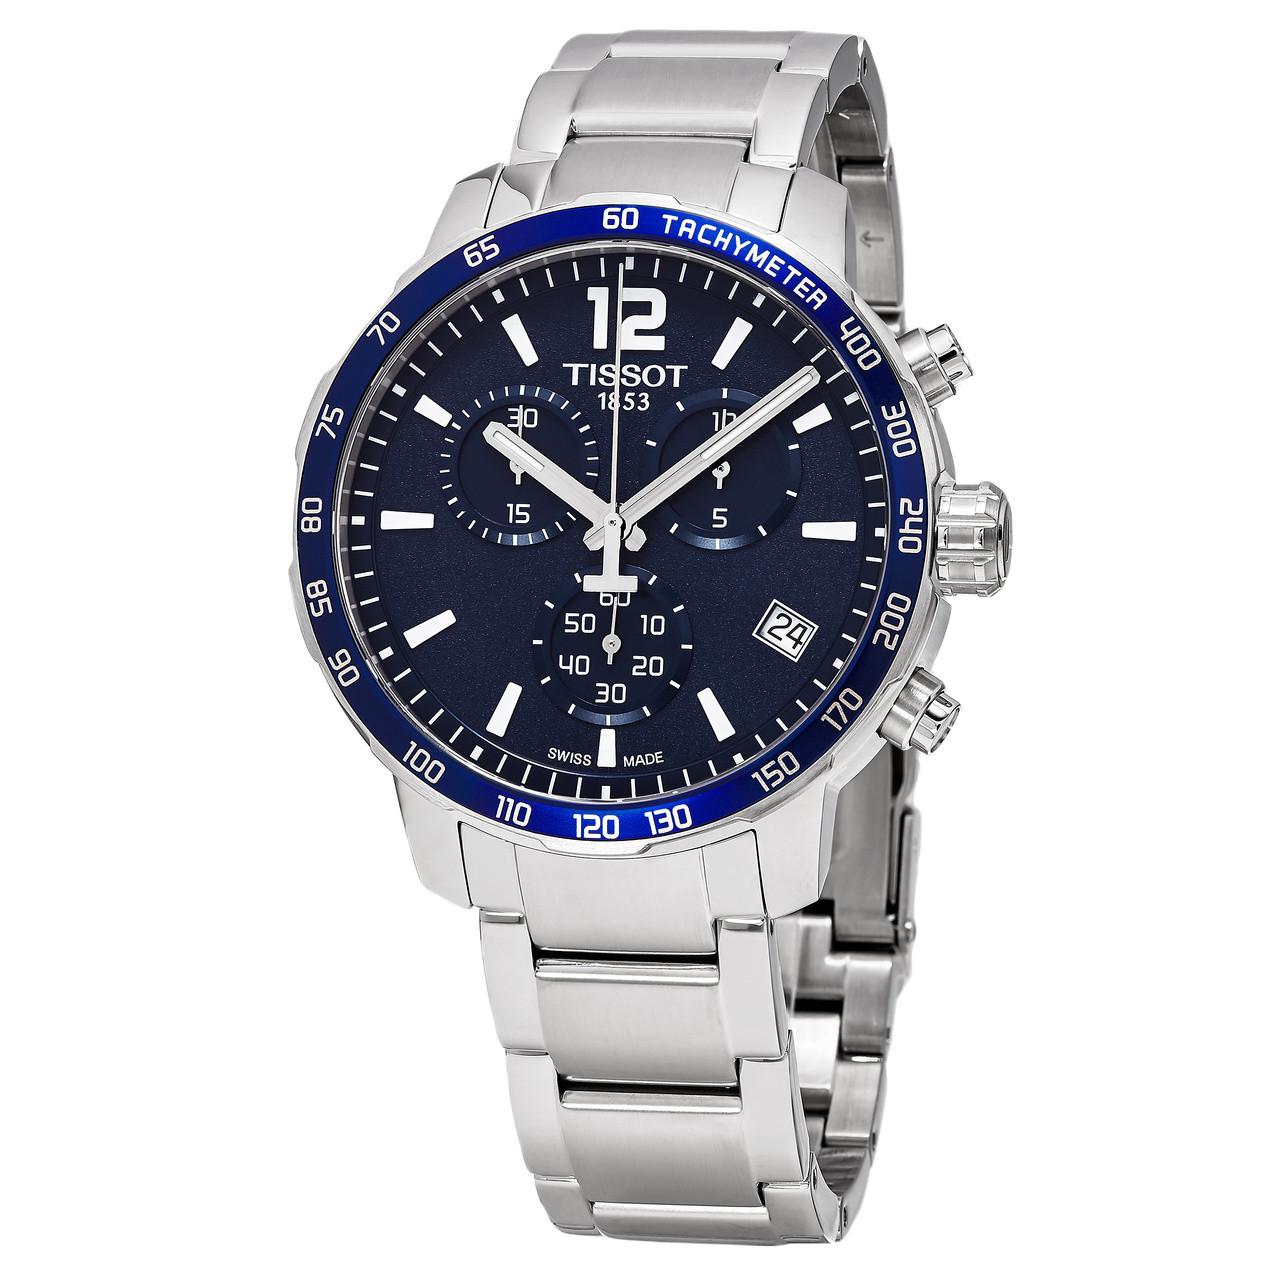 87e570c7e70 Tissot Men's Swiss Quartz Stainless Steel Casual Watch (Model ...